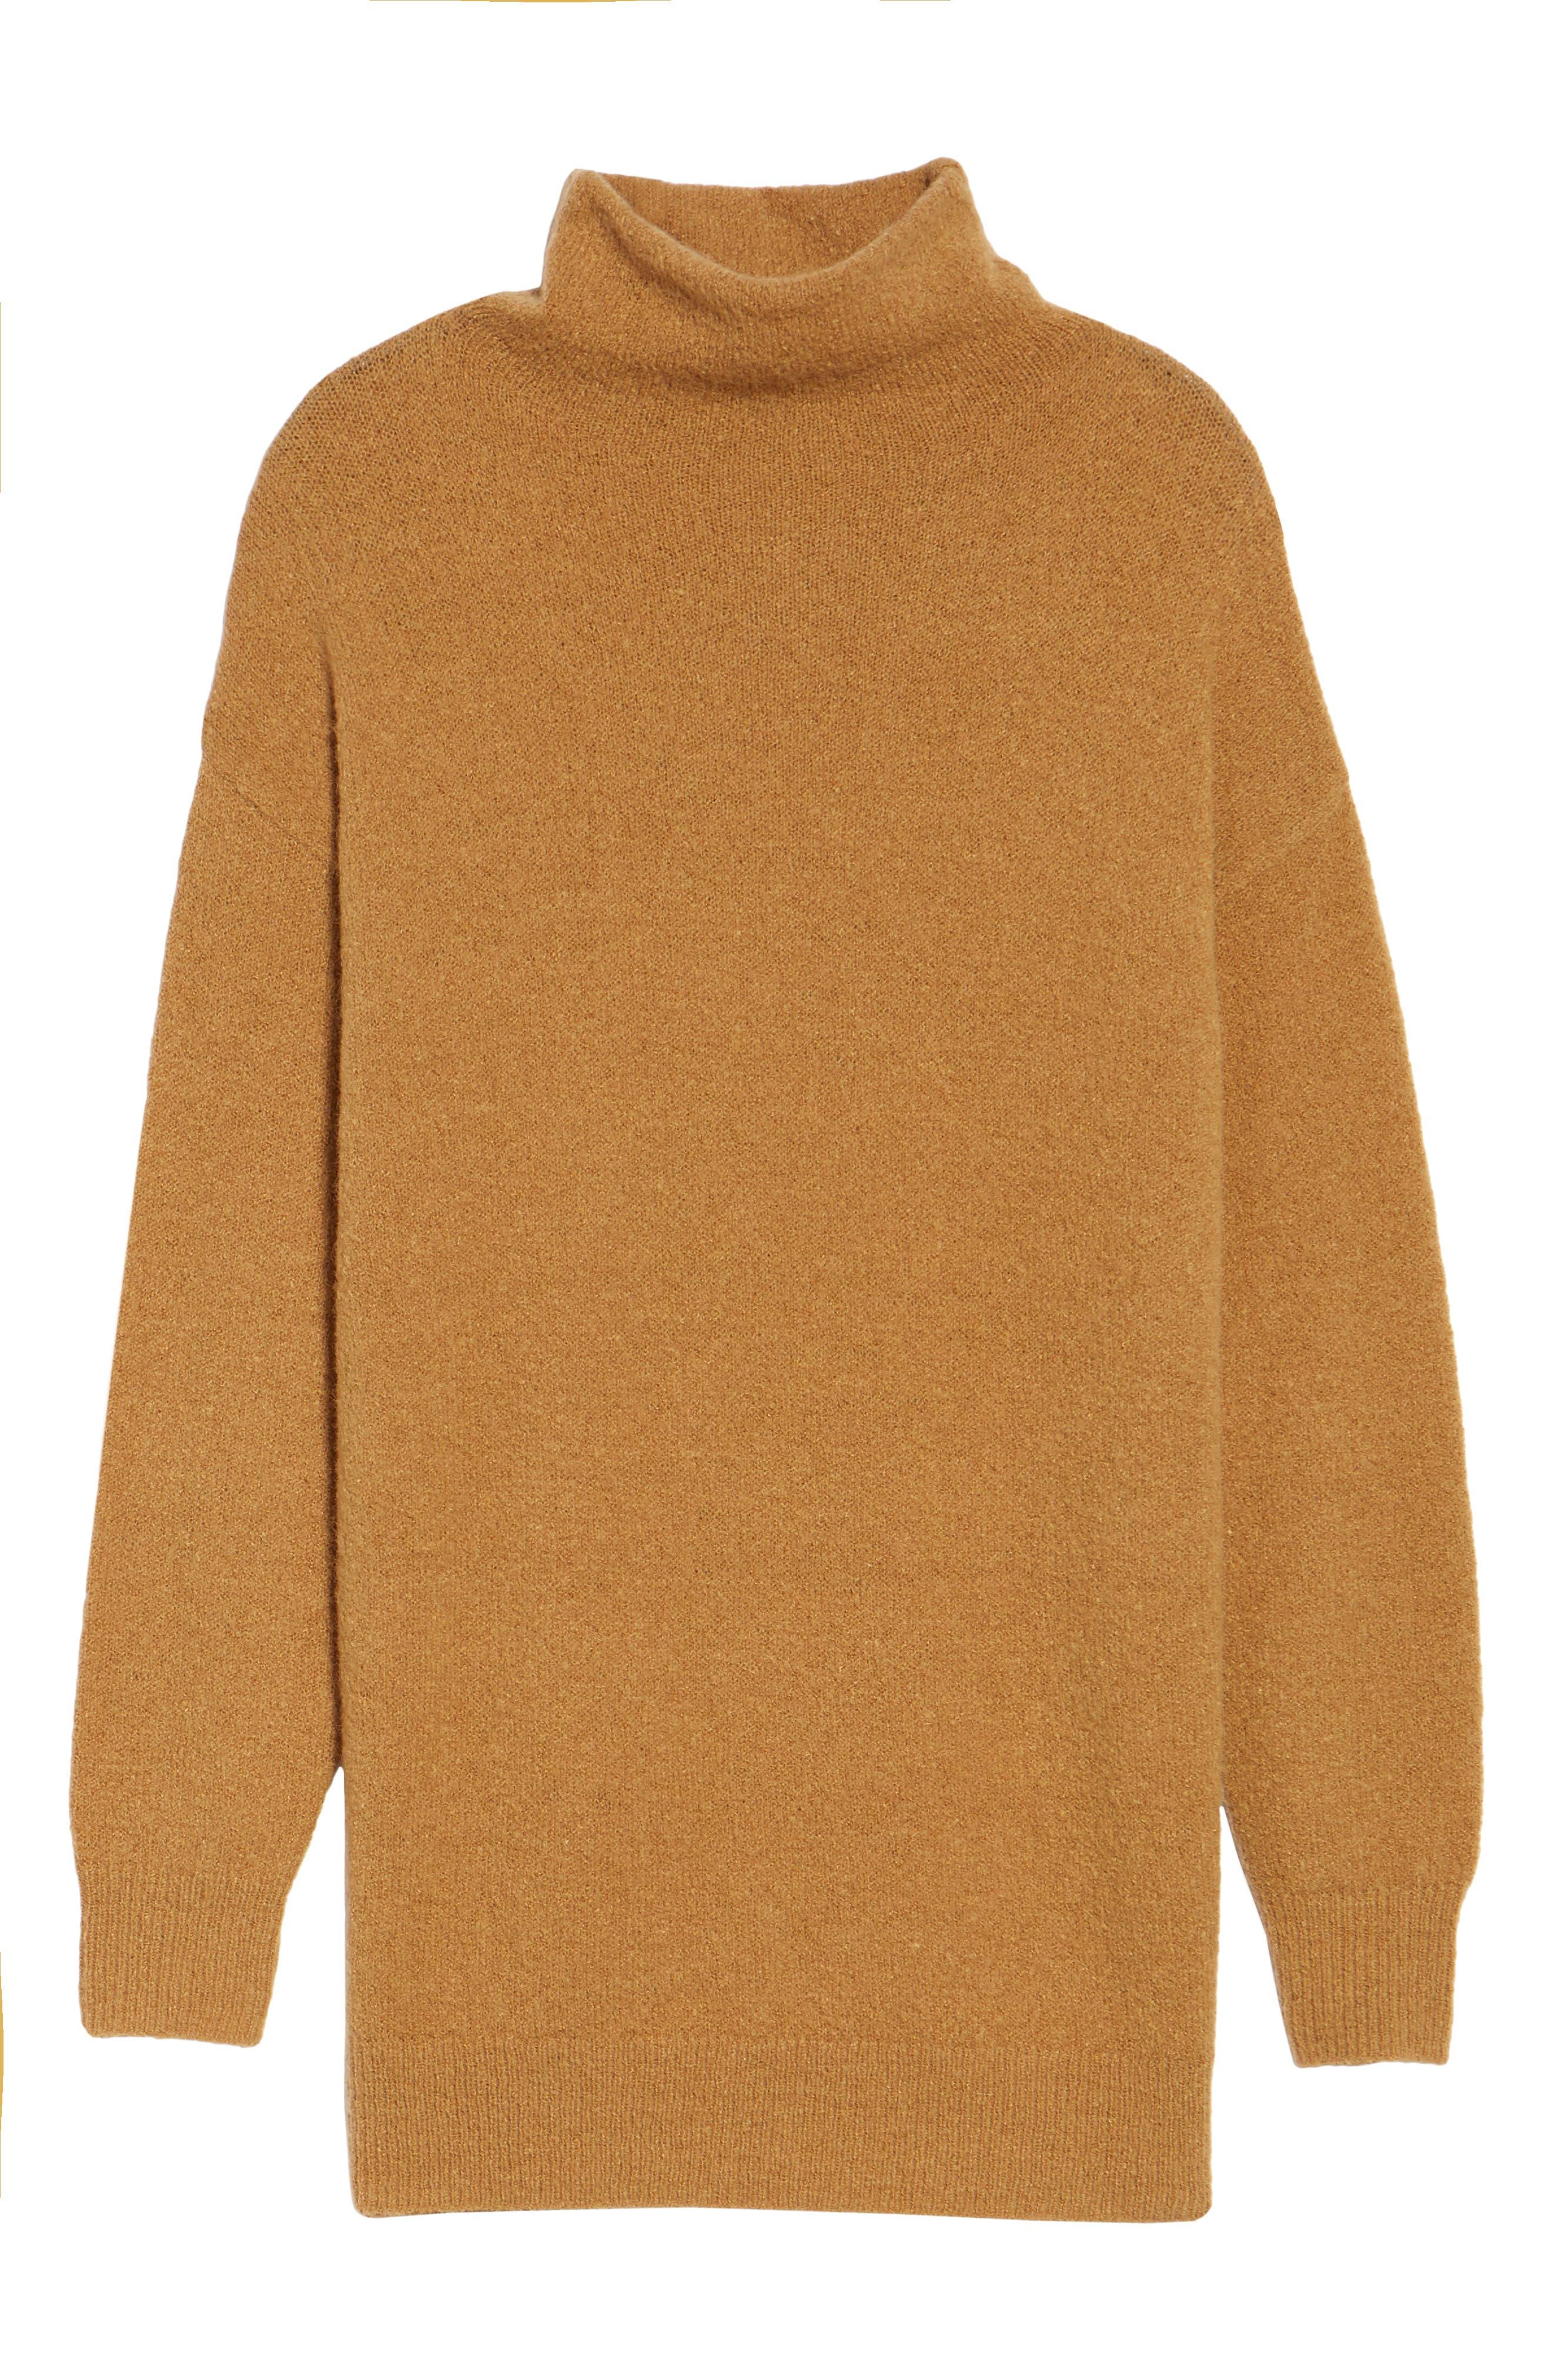 Bouclé Turtleneck Tunic Sweater,                             Alternate thumbnail 6, color,                             Brown Cattail